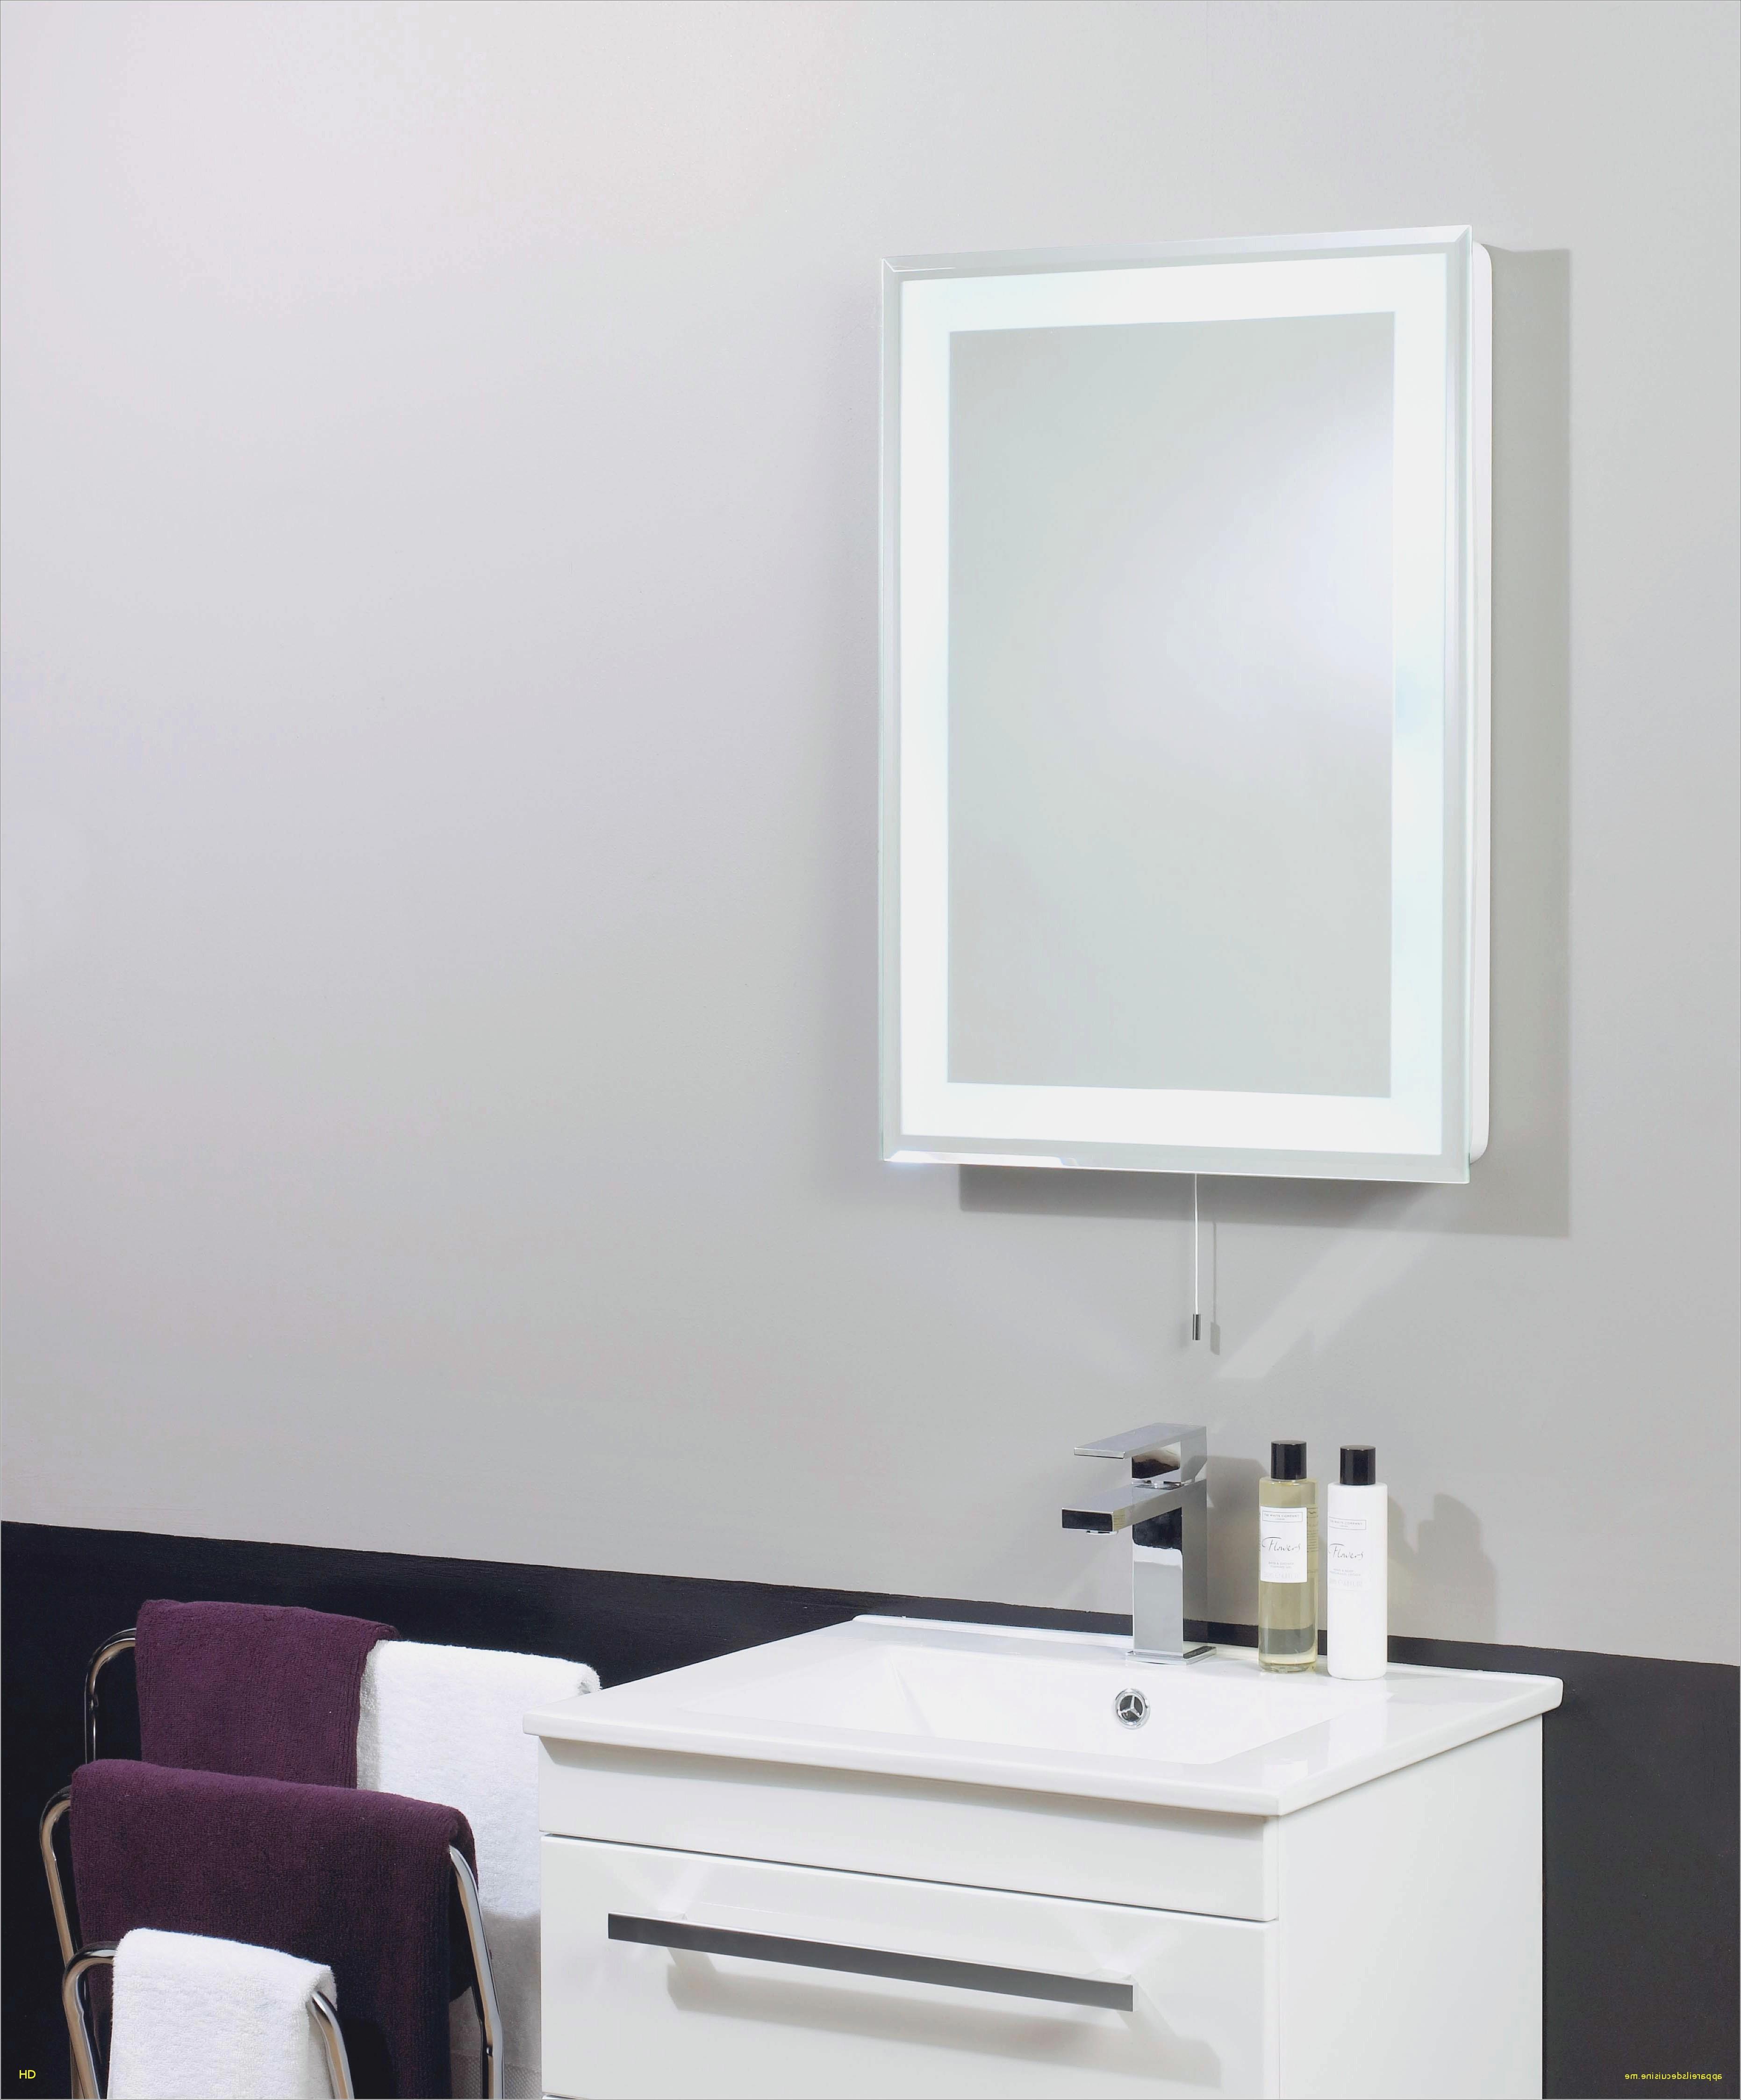 Castorama Accessoires Salle De Bain Frais Photos Meuble Miroir Salle De Bain Castorama Miroir Salle De Bain Led